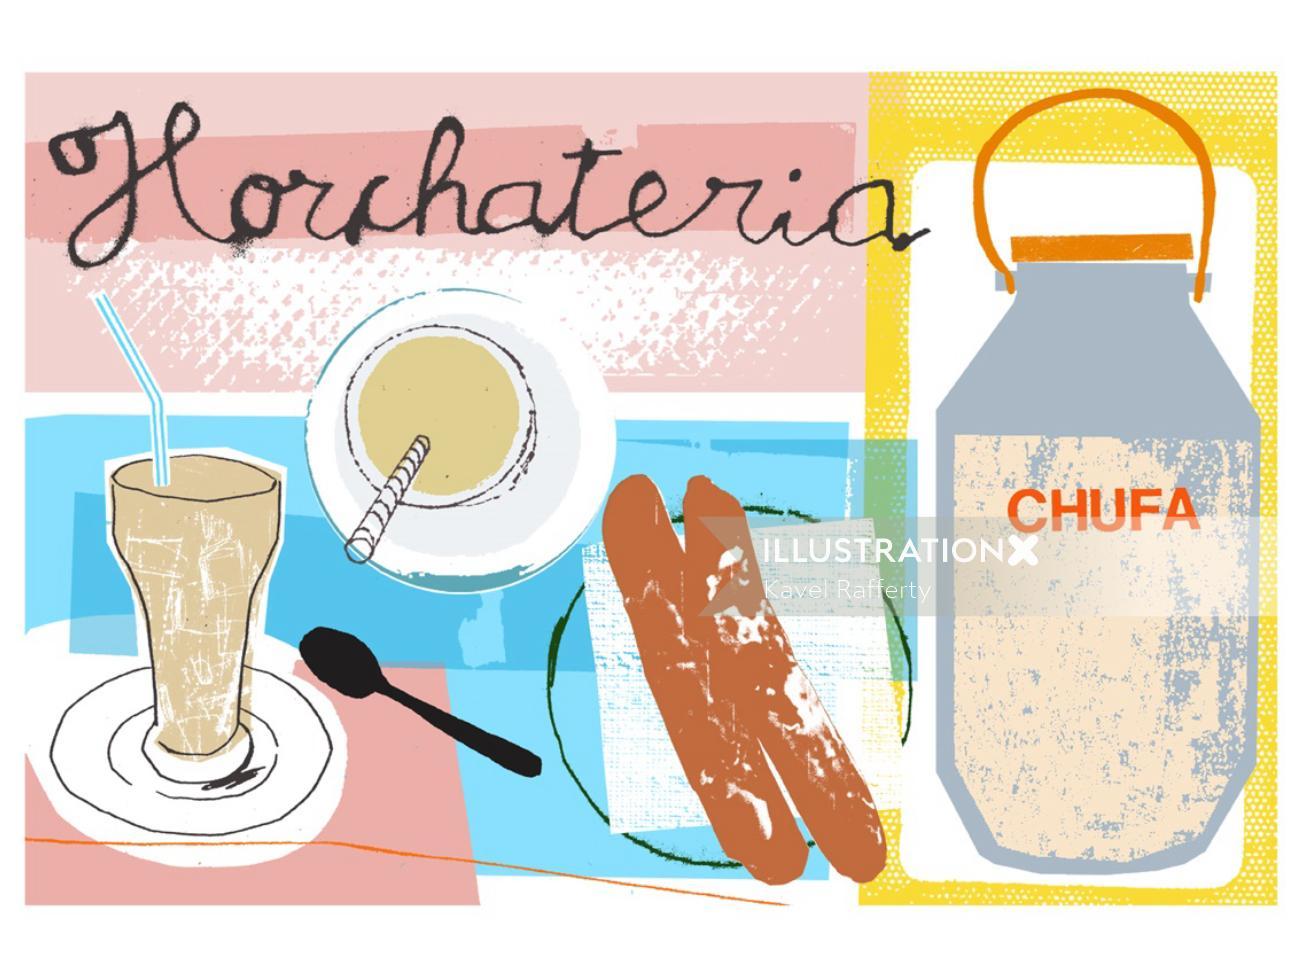 horchateria illustration